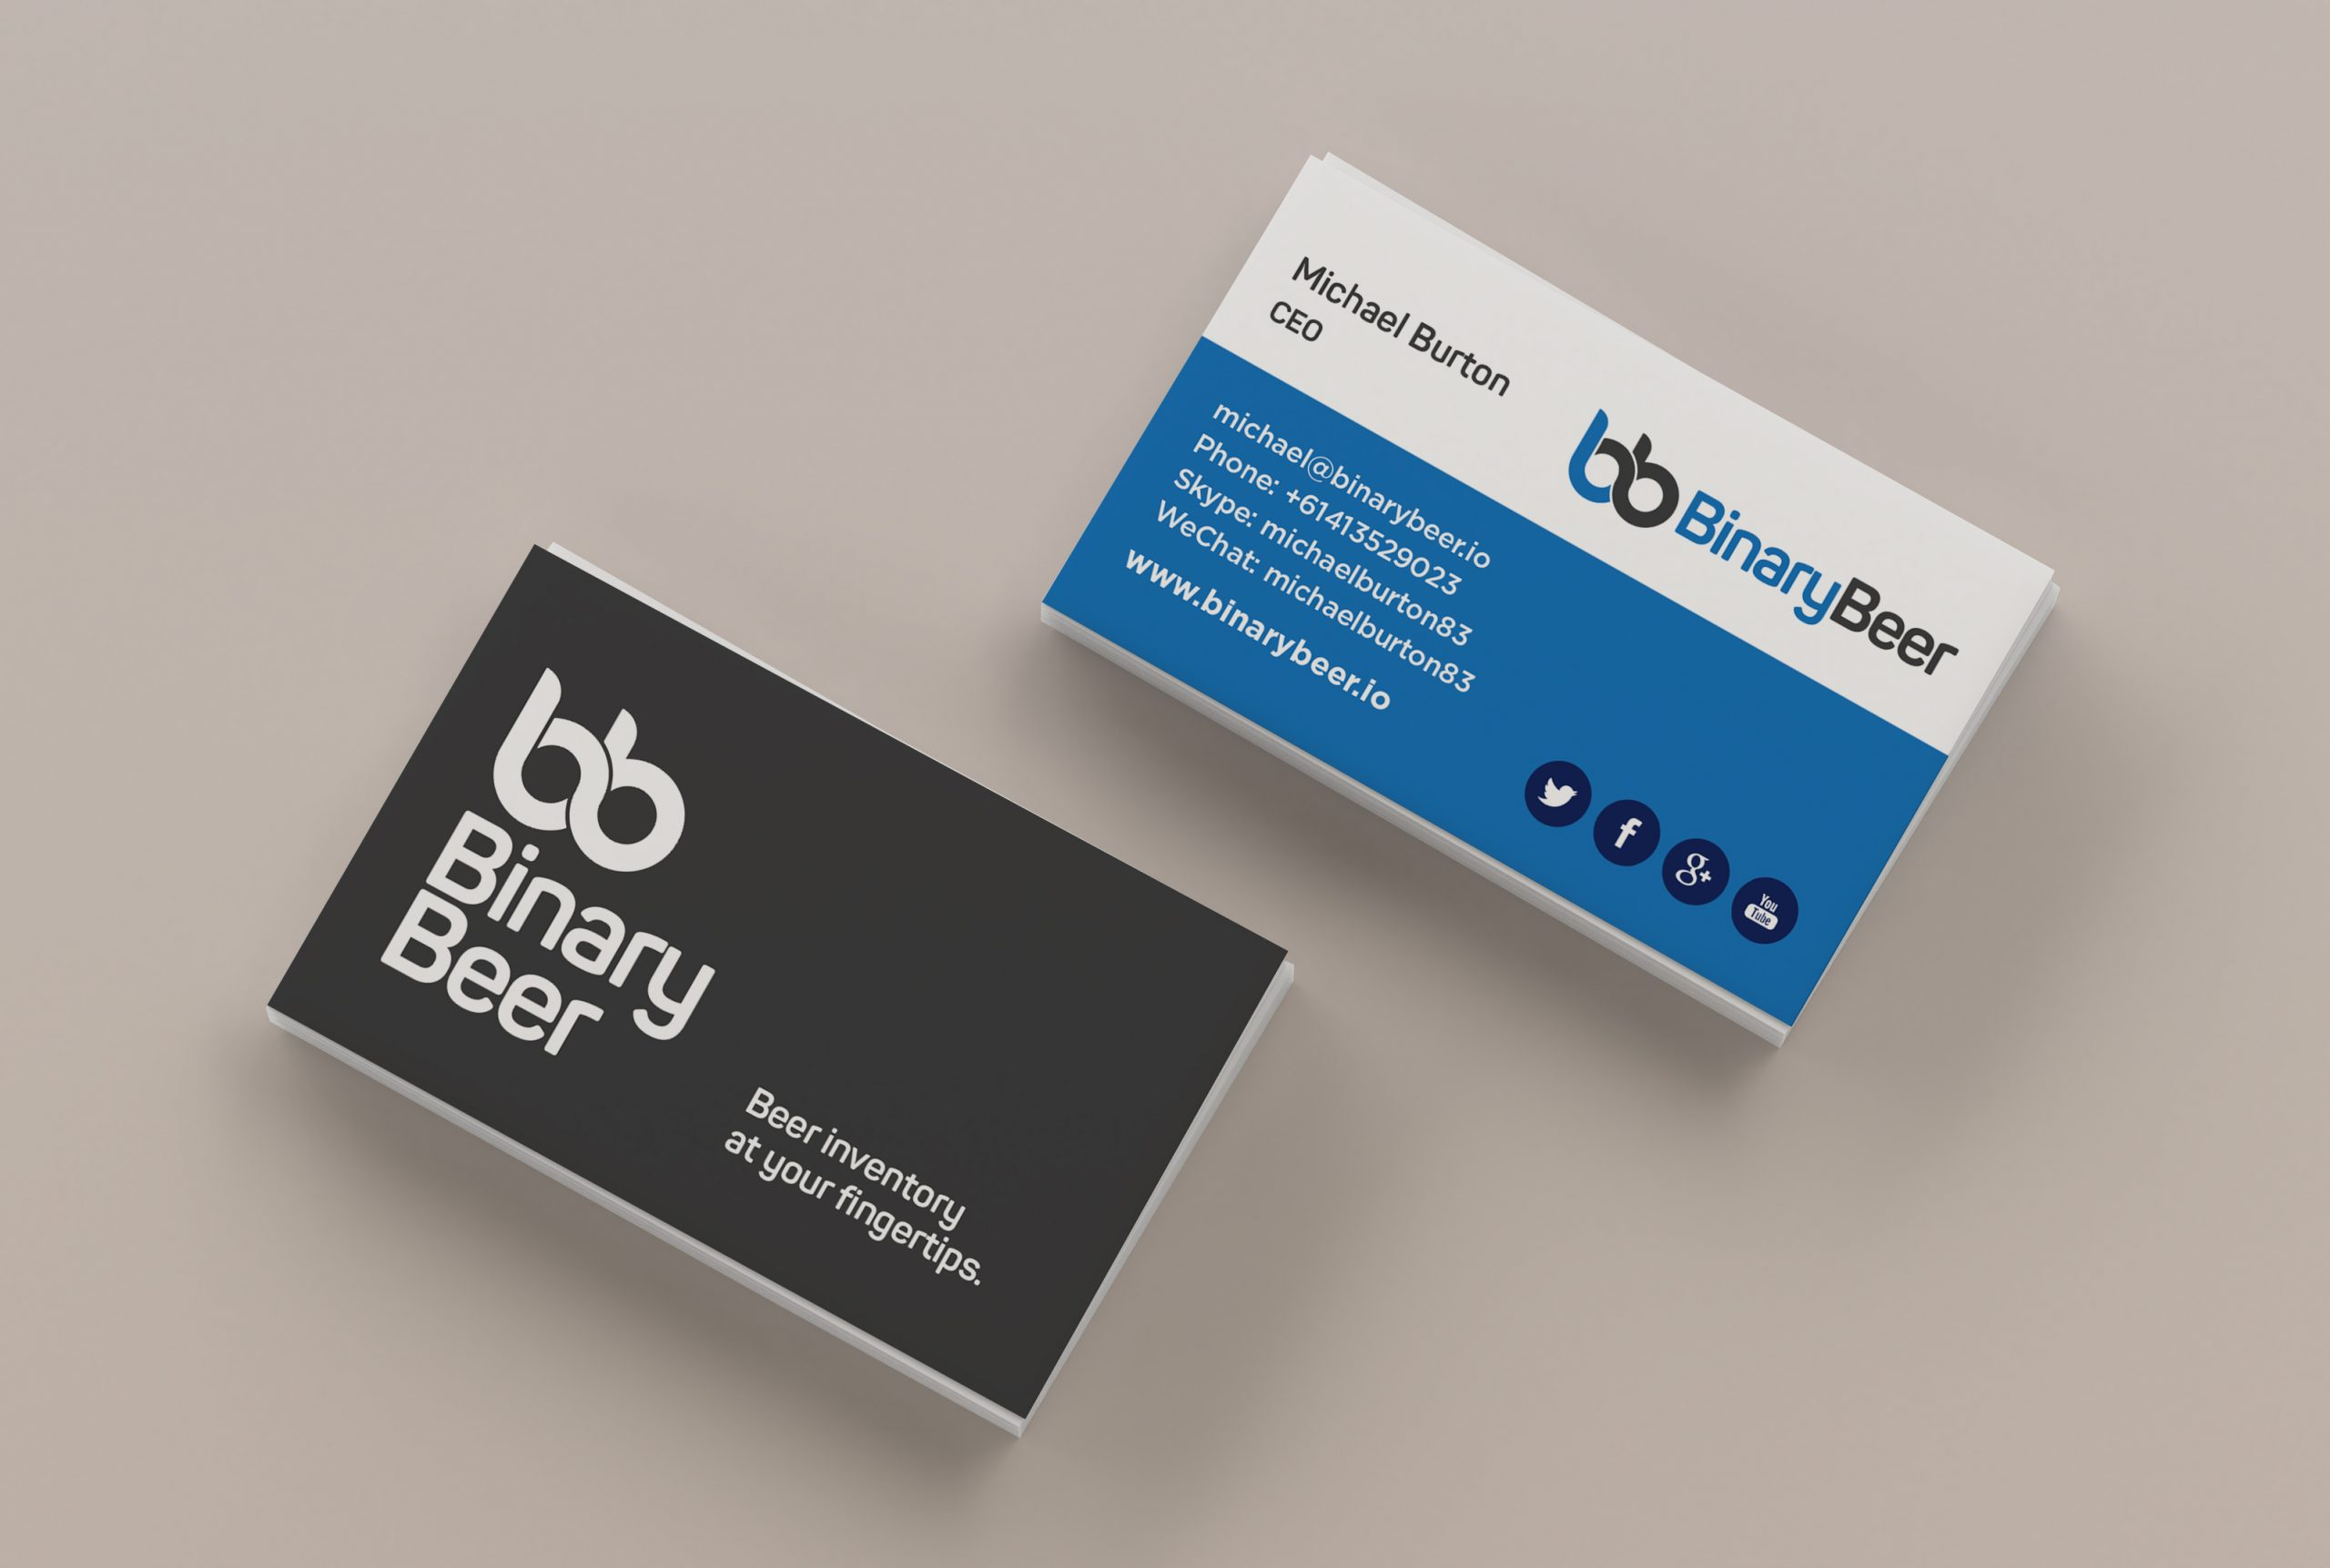 Binary Beer business card design